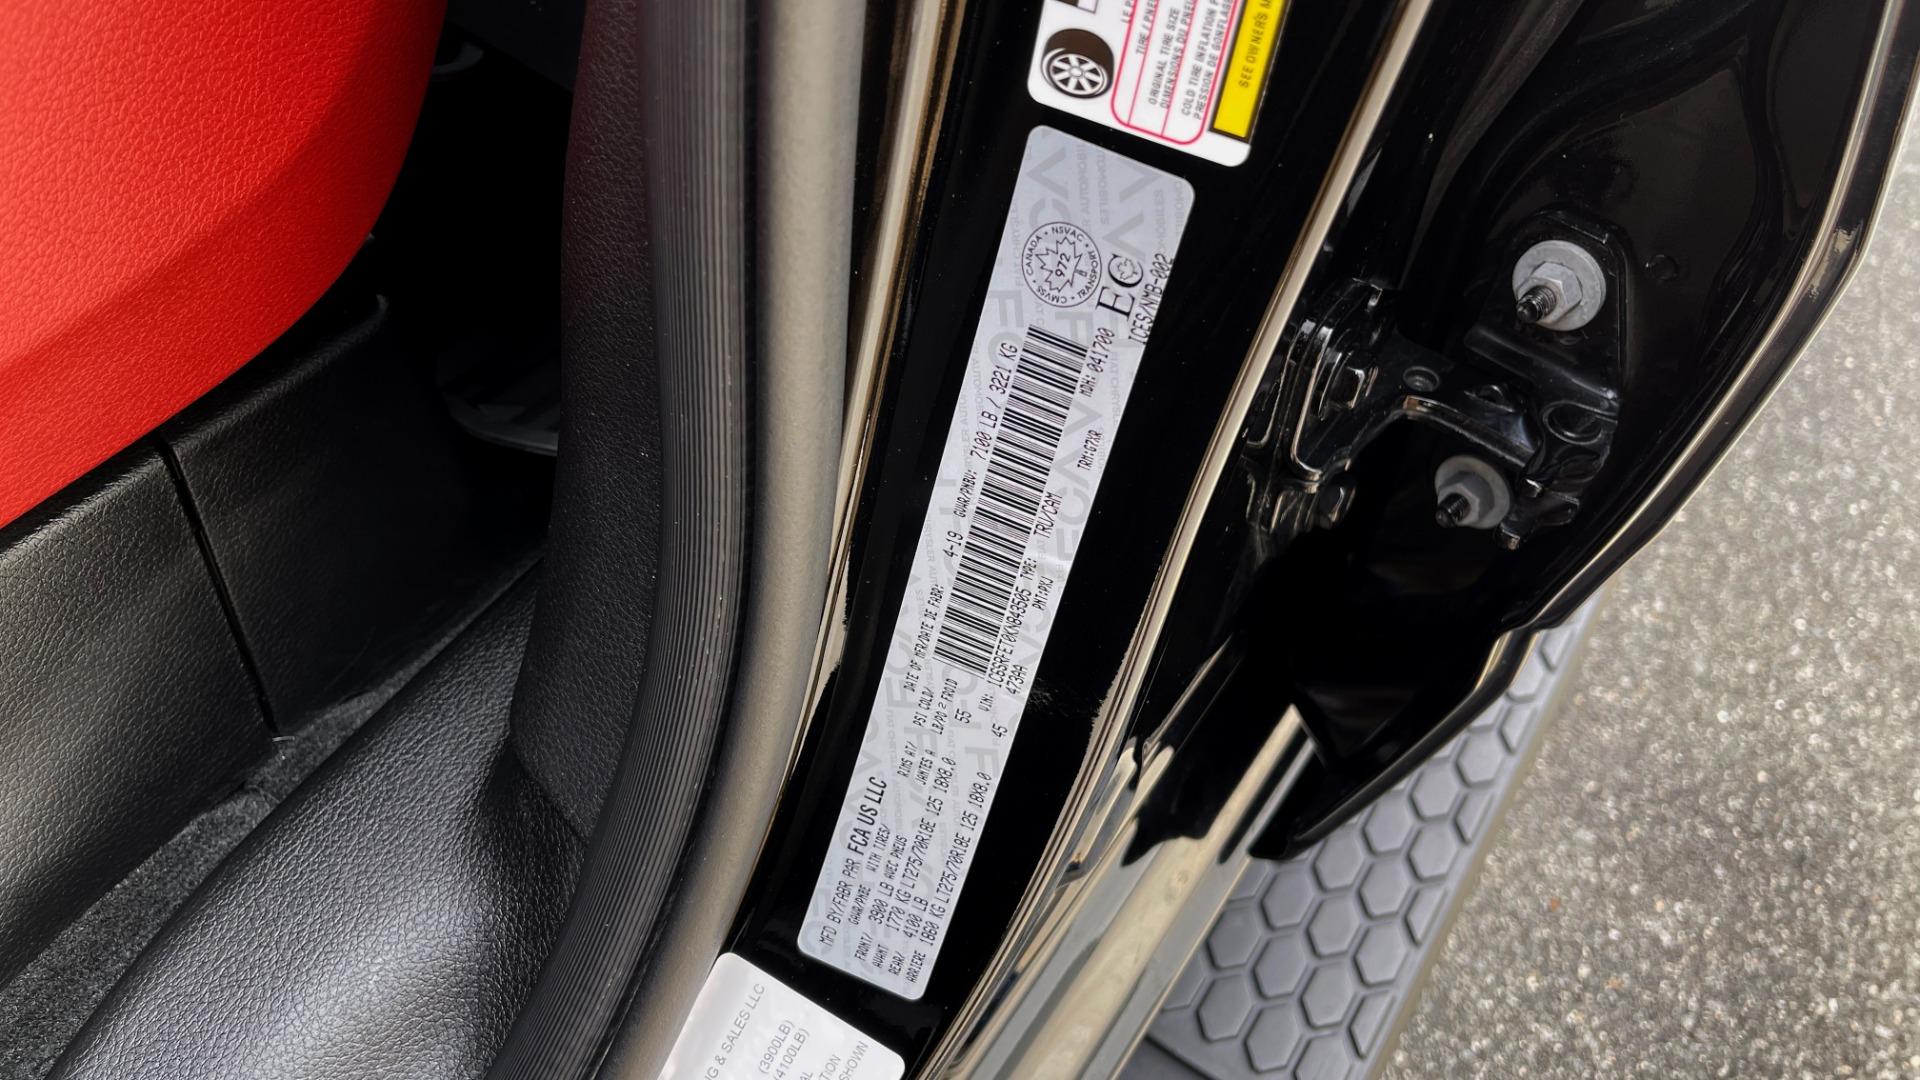 Used 2019 Ram 1500 REBEL QUADCAB 4X4 / 5.7L HEMI / 8-SPD AUTO / REMOTE START / PARK ASSIST for sale $44,495 at Formula Imports in Charlotte NC 28227 79